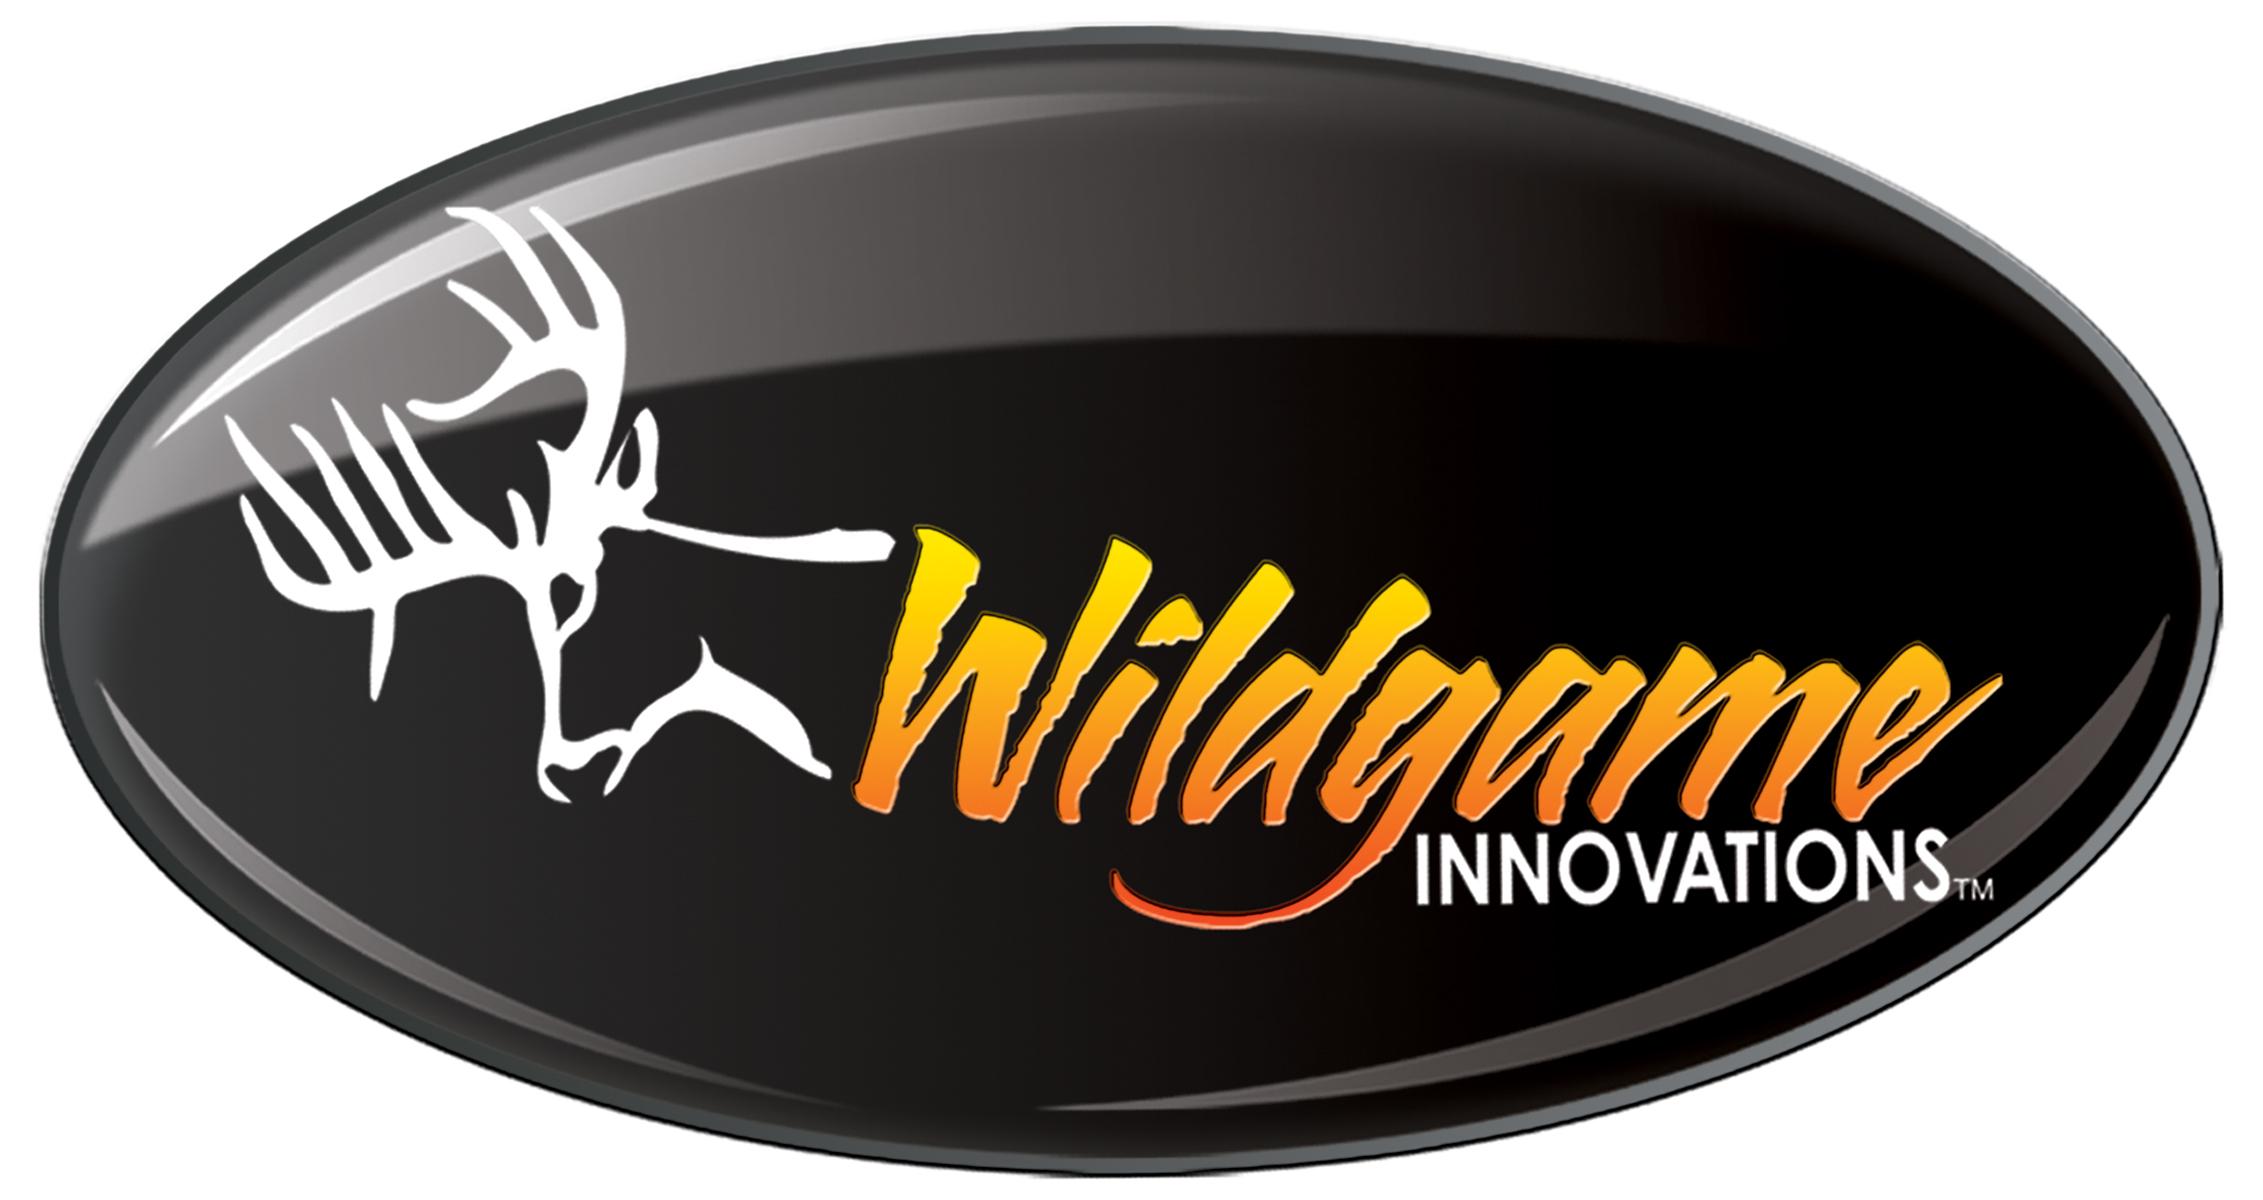 Wildgame Innovations Logo Wildgame Innovations